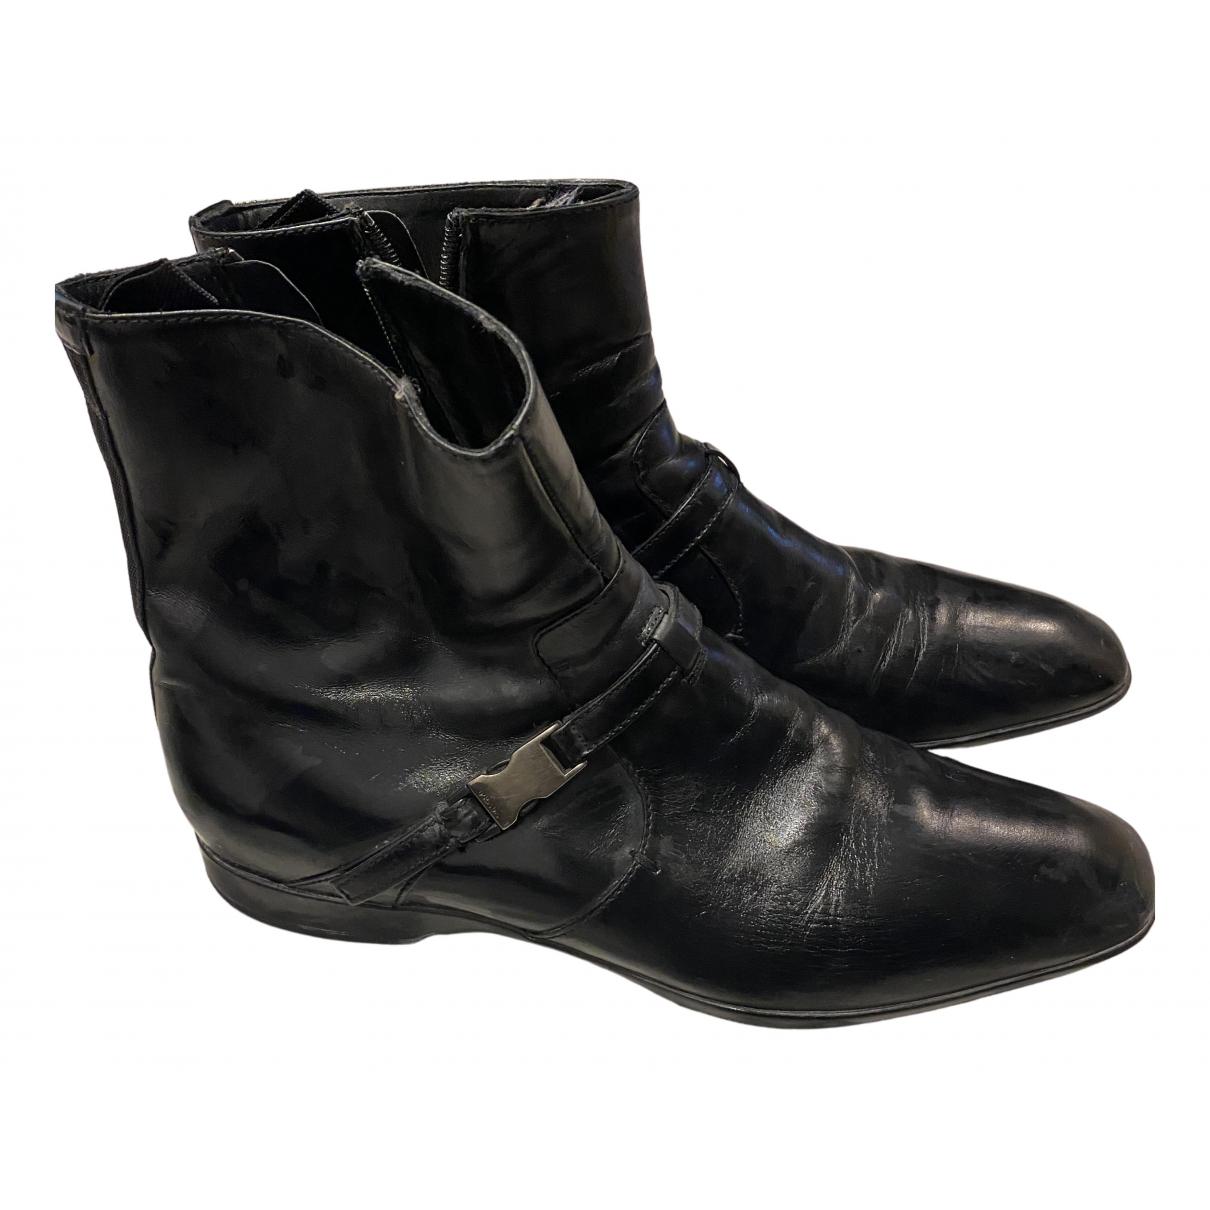 Prada N Black Leather Boots for Men 6.5 US